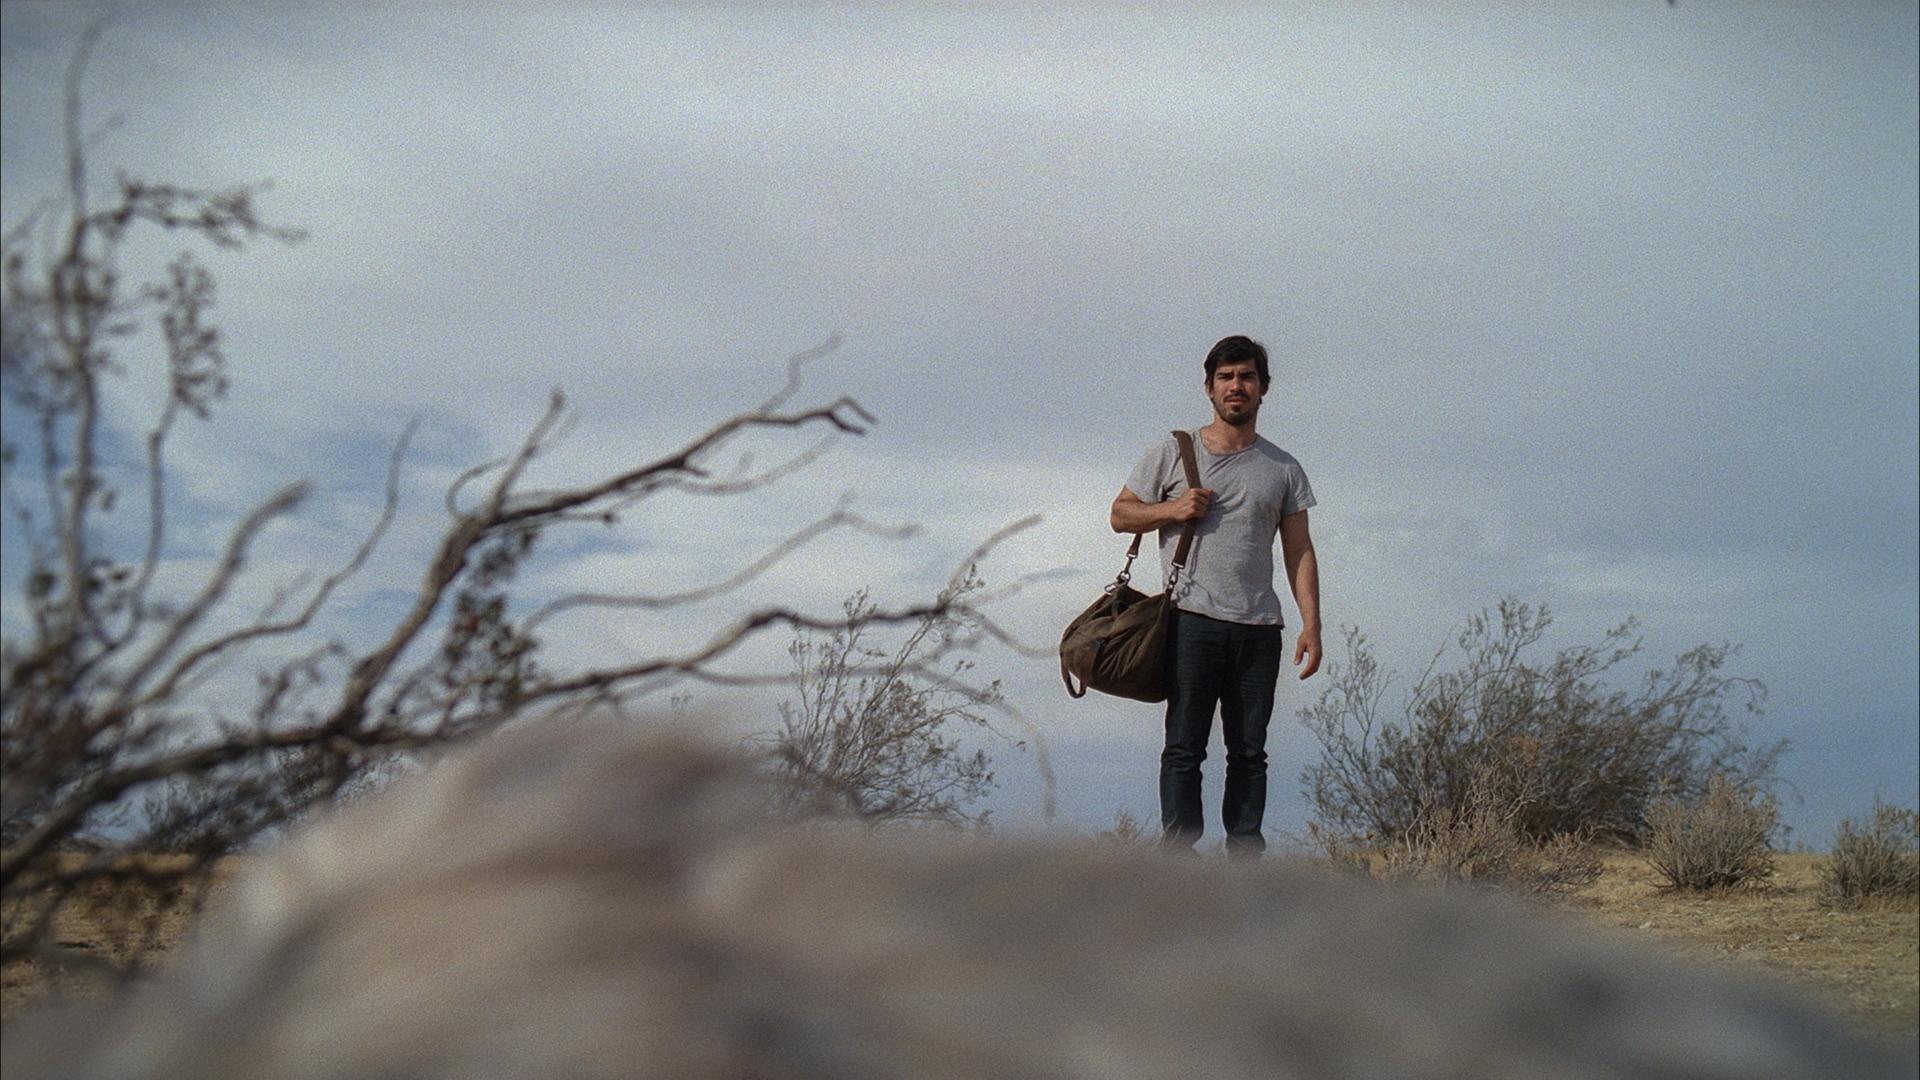 Limbo - Raúl Castillo stumbles across a dying dog in the middle of the desert